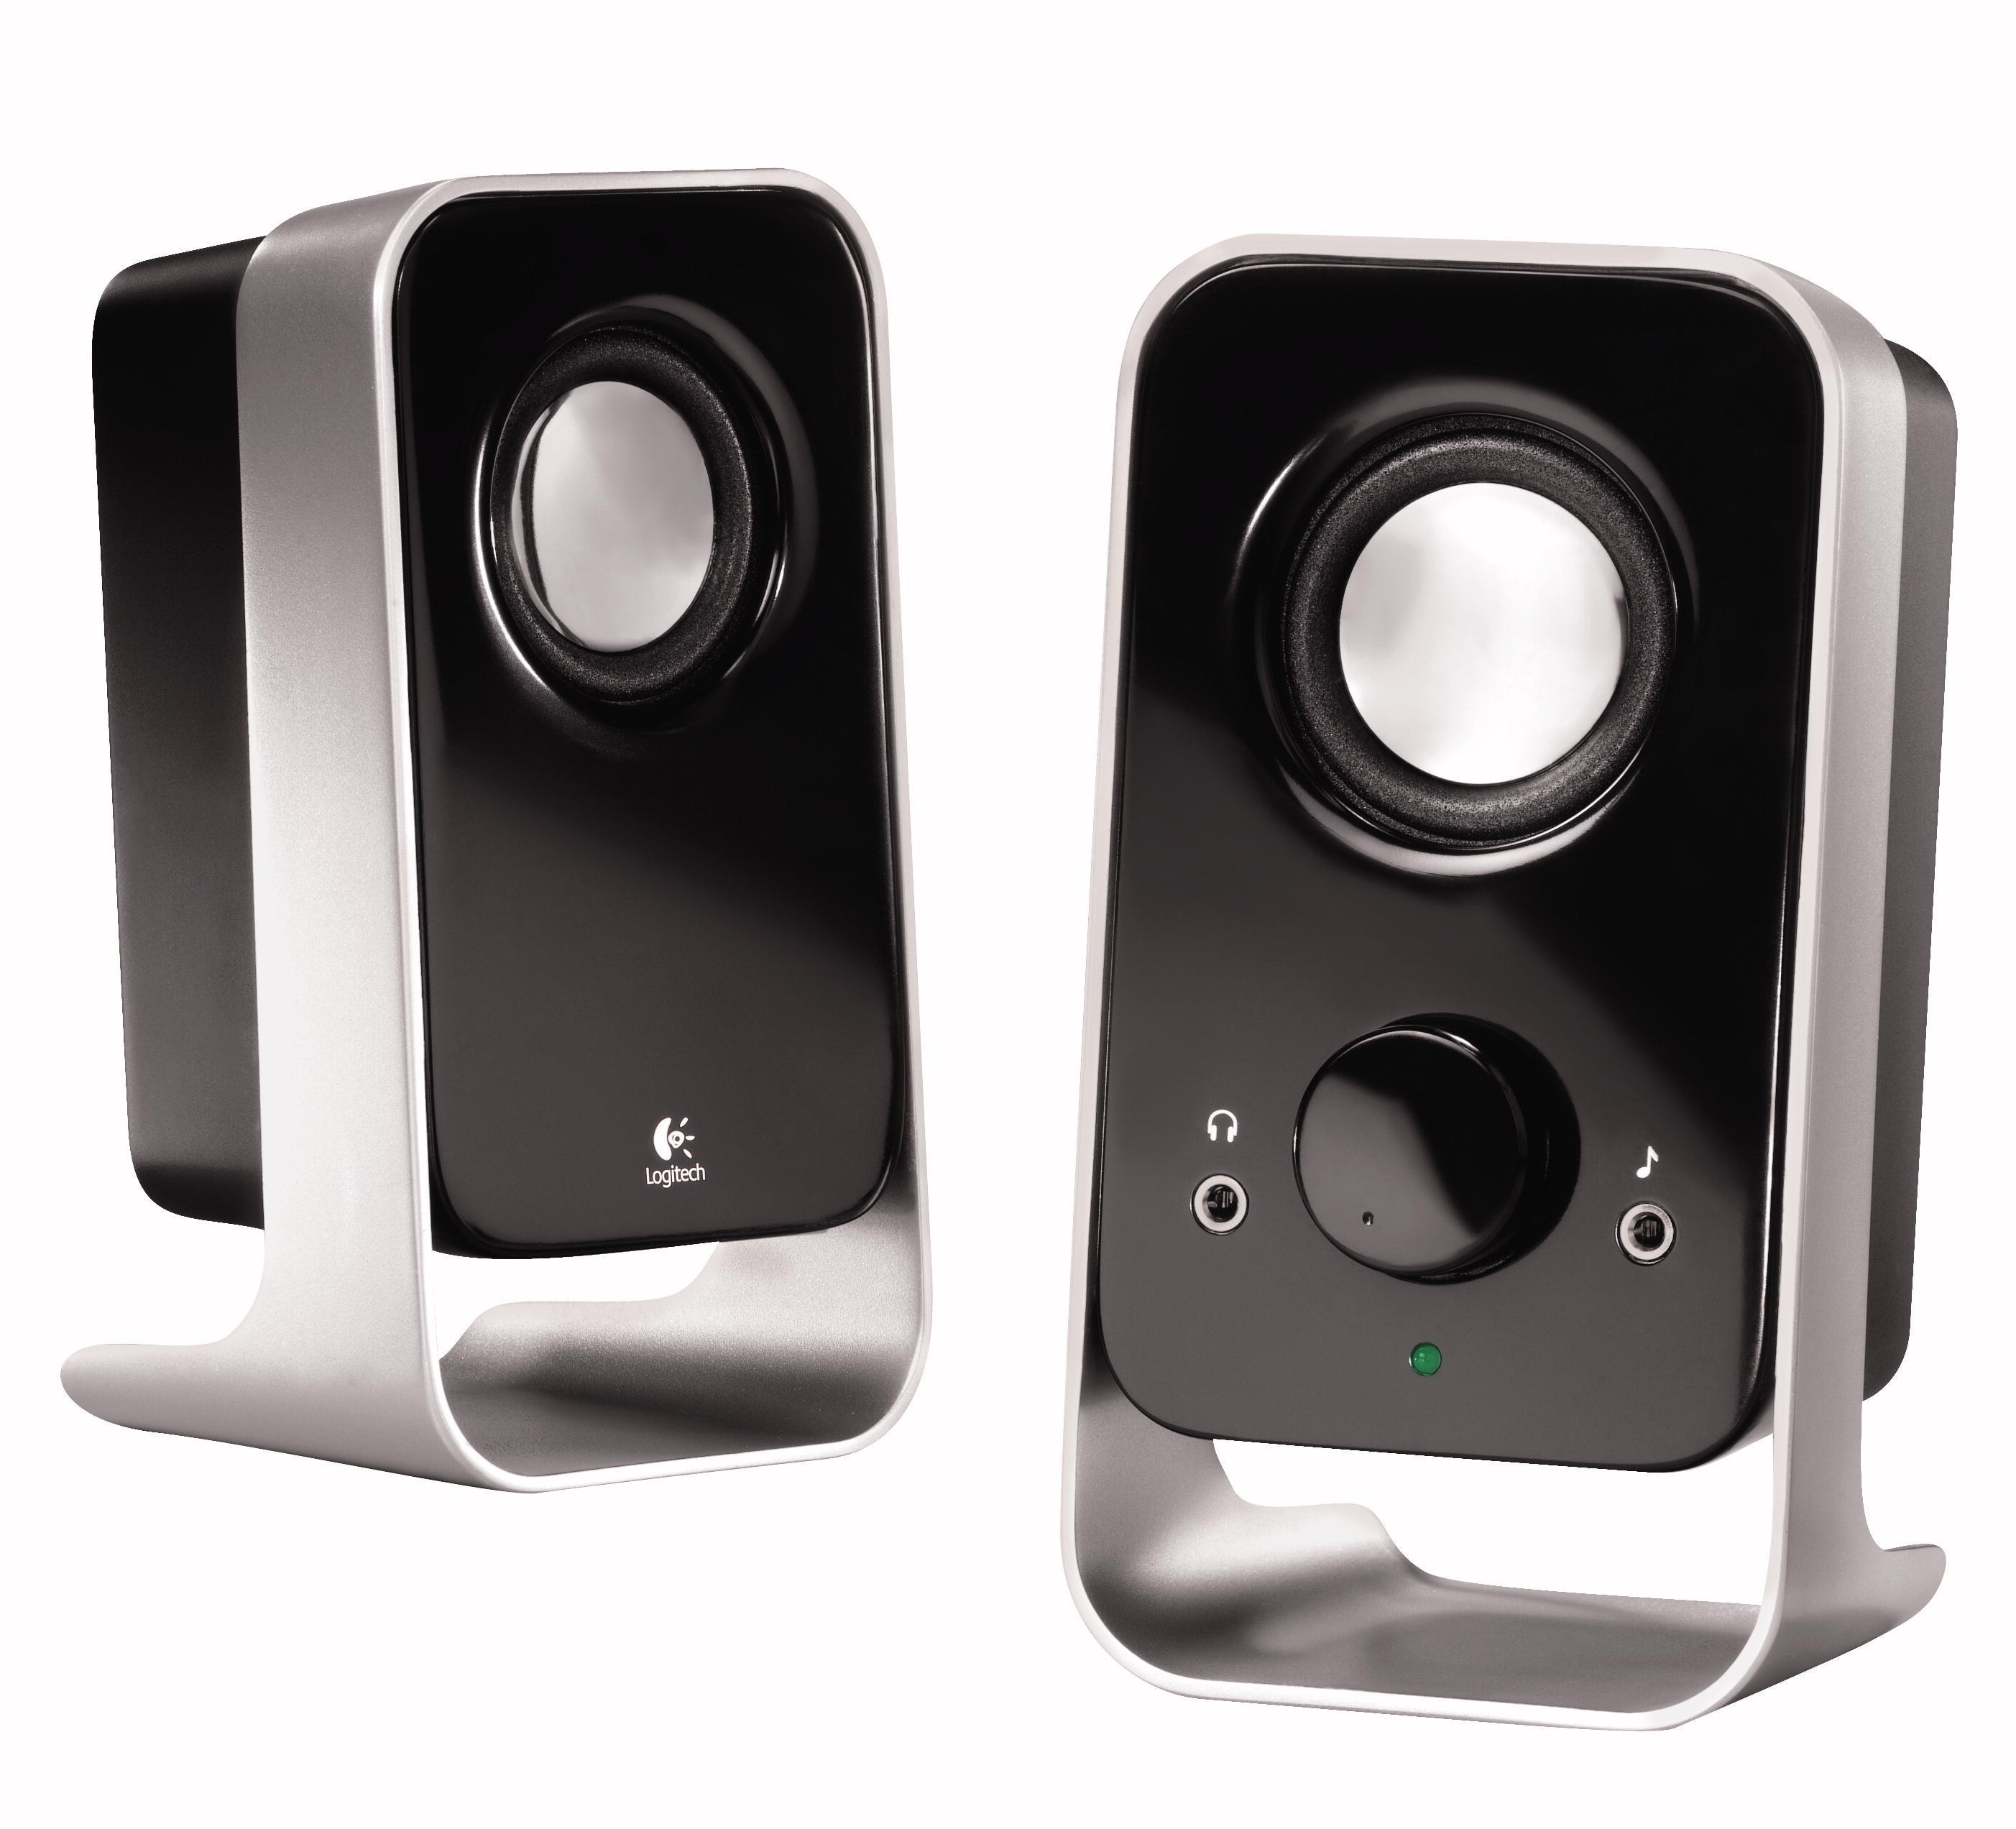 Logitech LS-11 Speakers